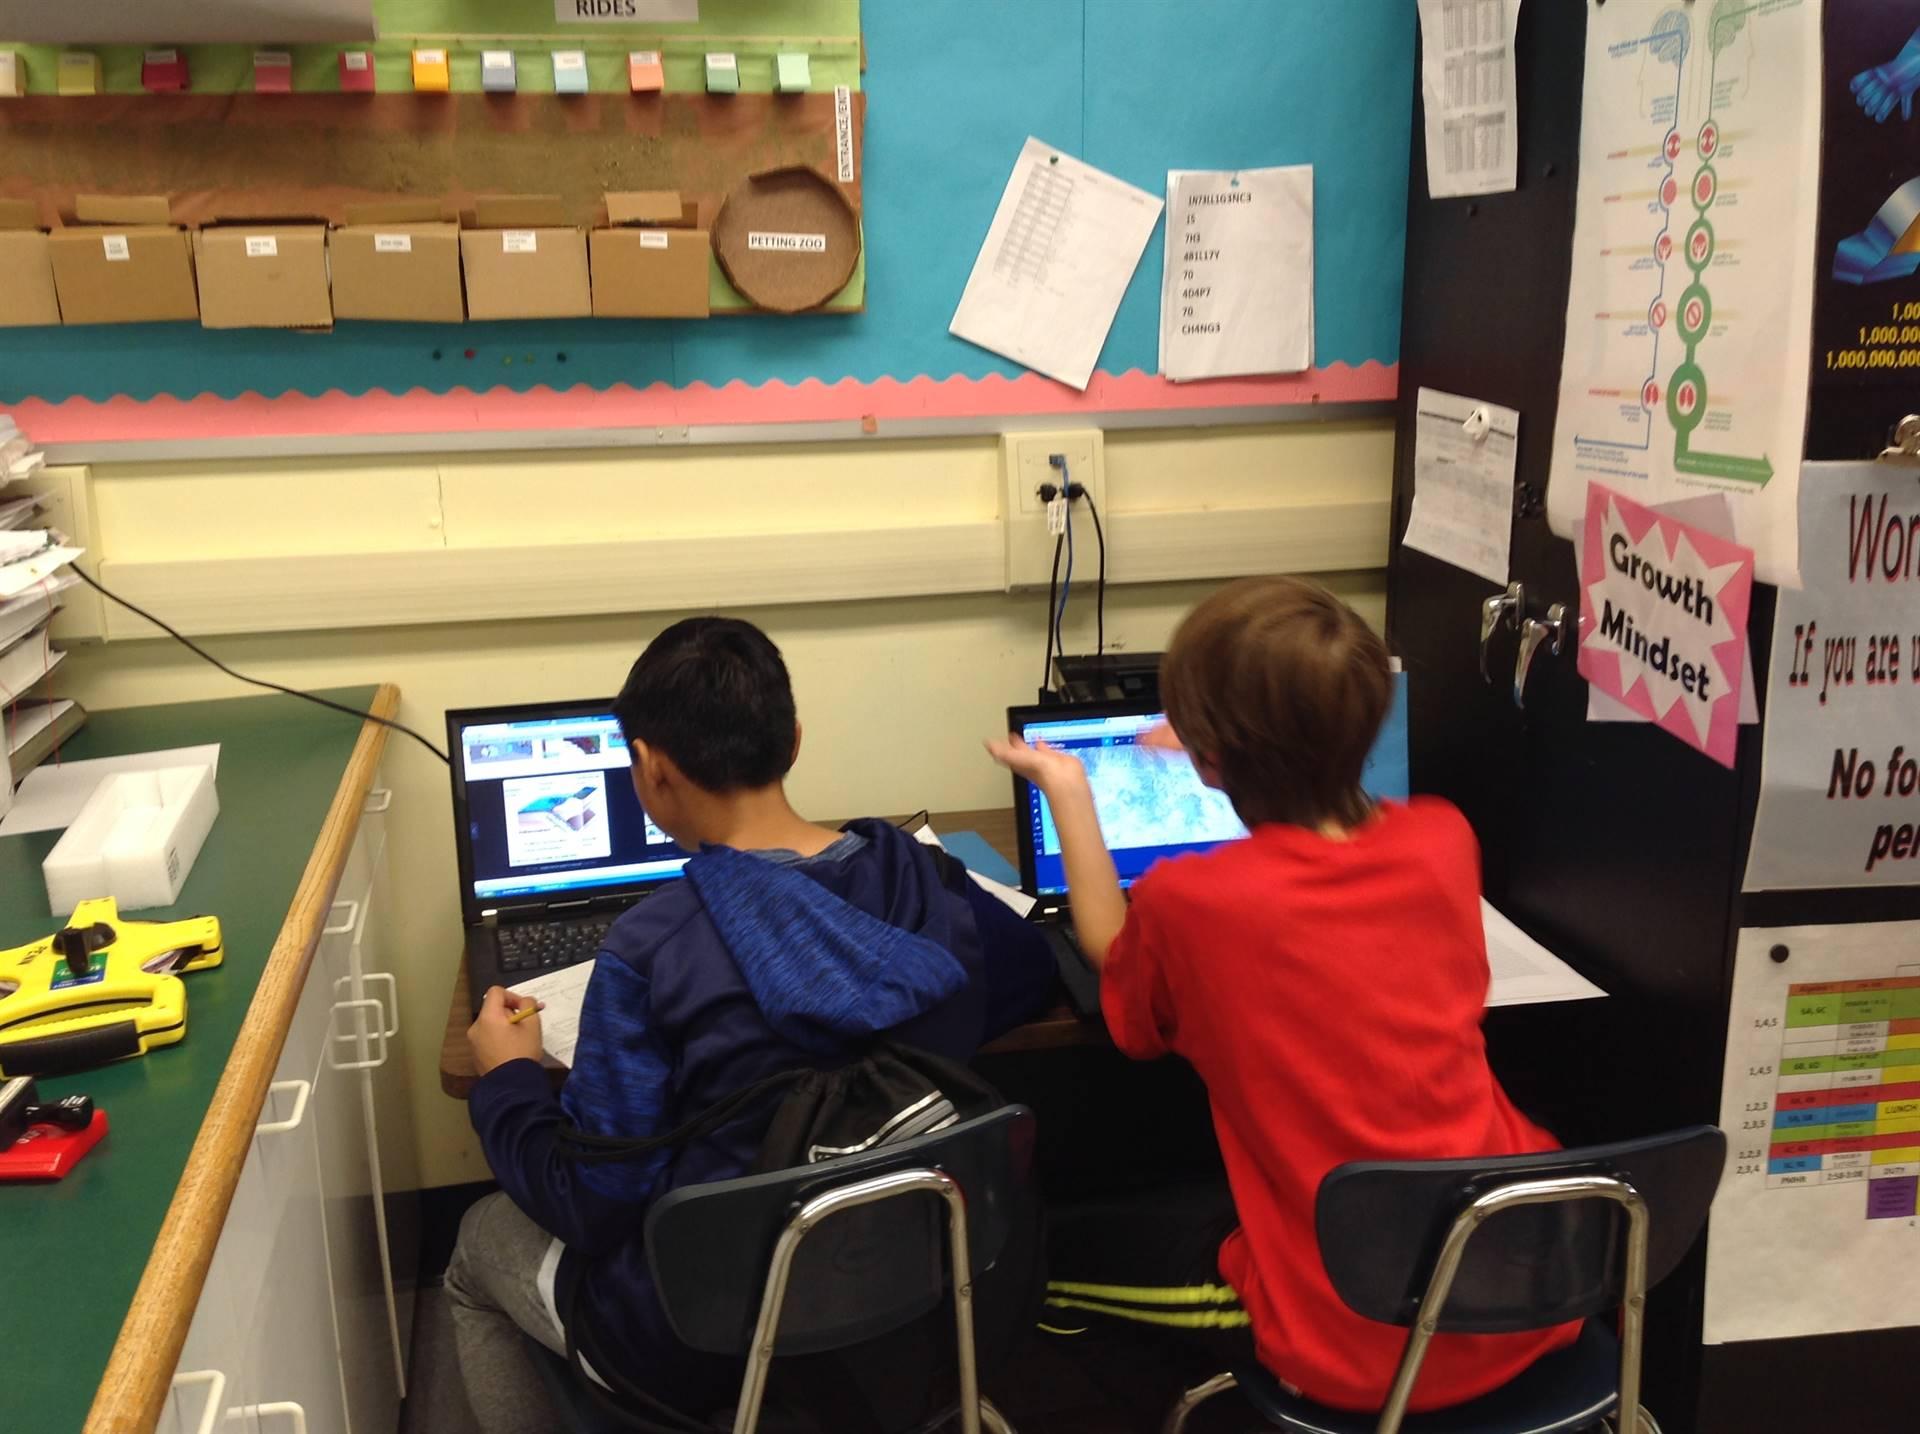 Working on Google Classroom